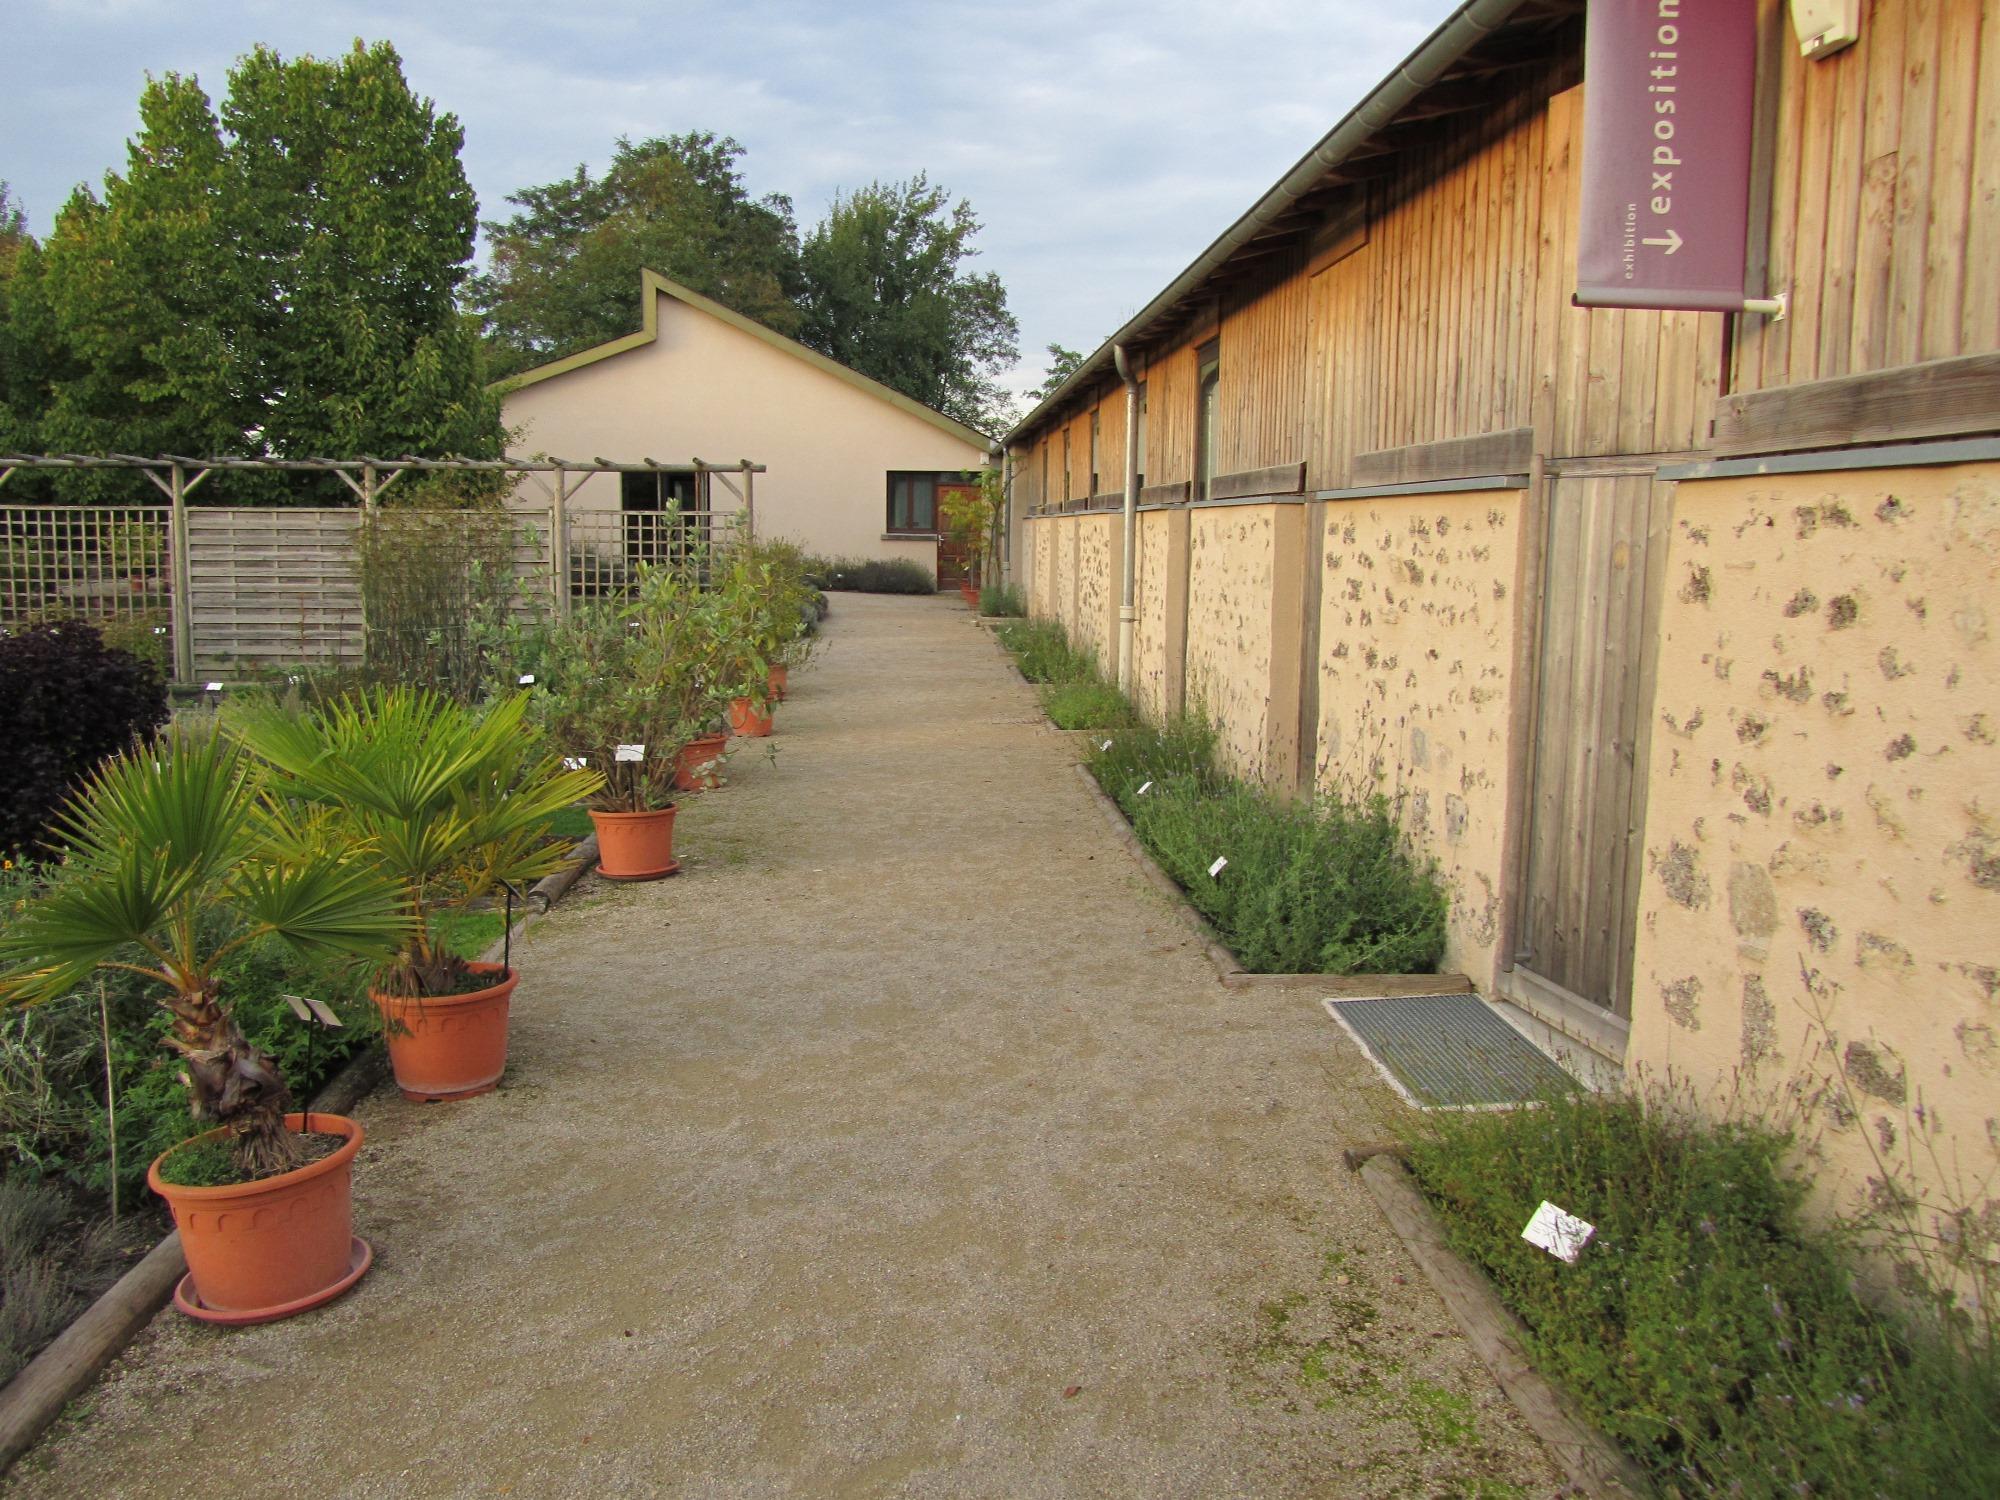 Jardins du Conservatoire